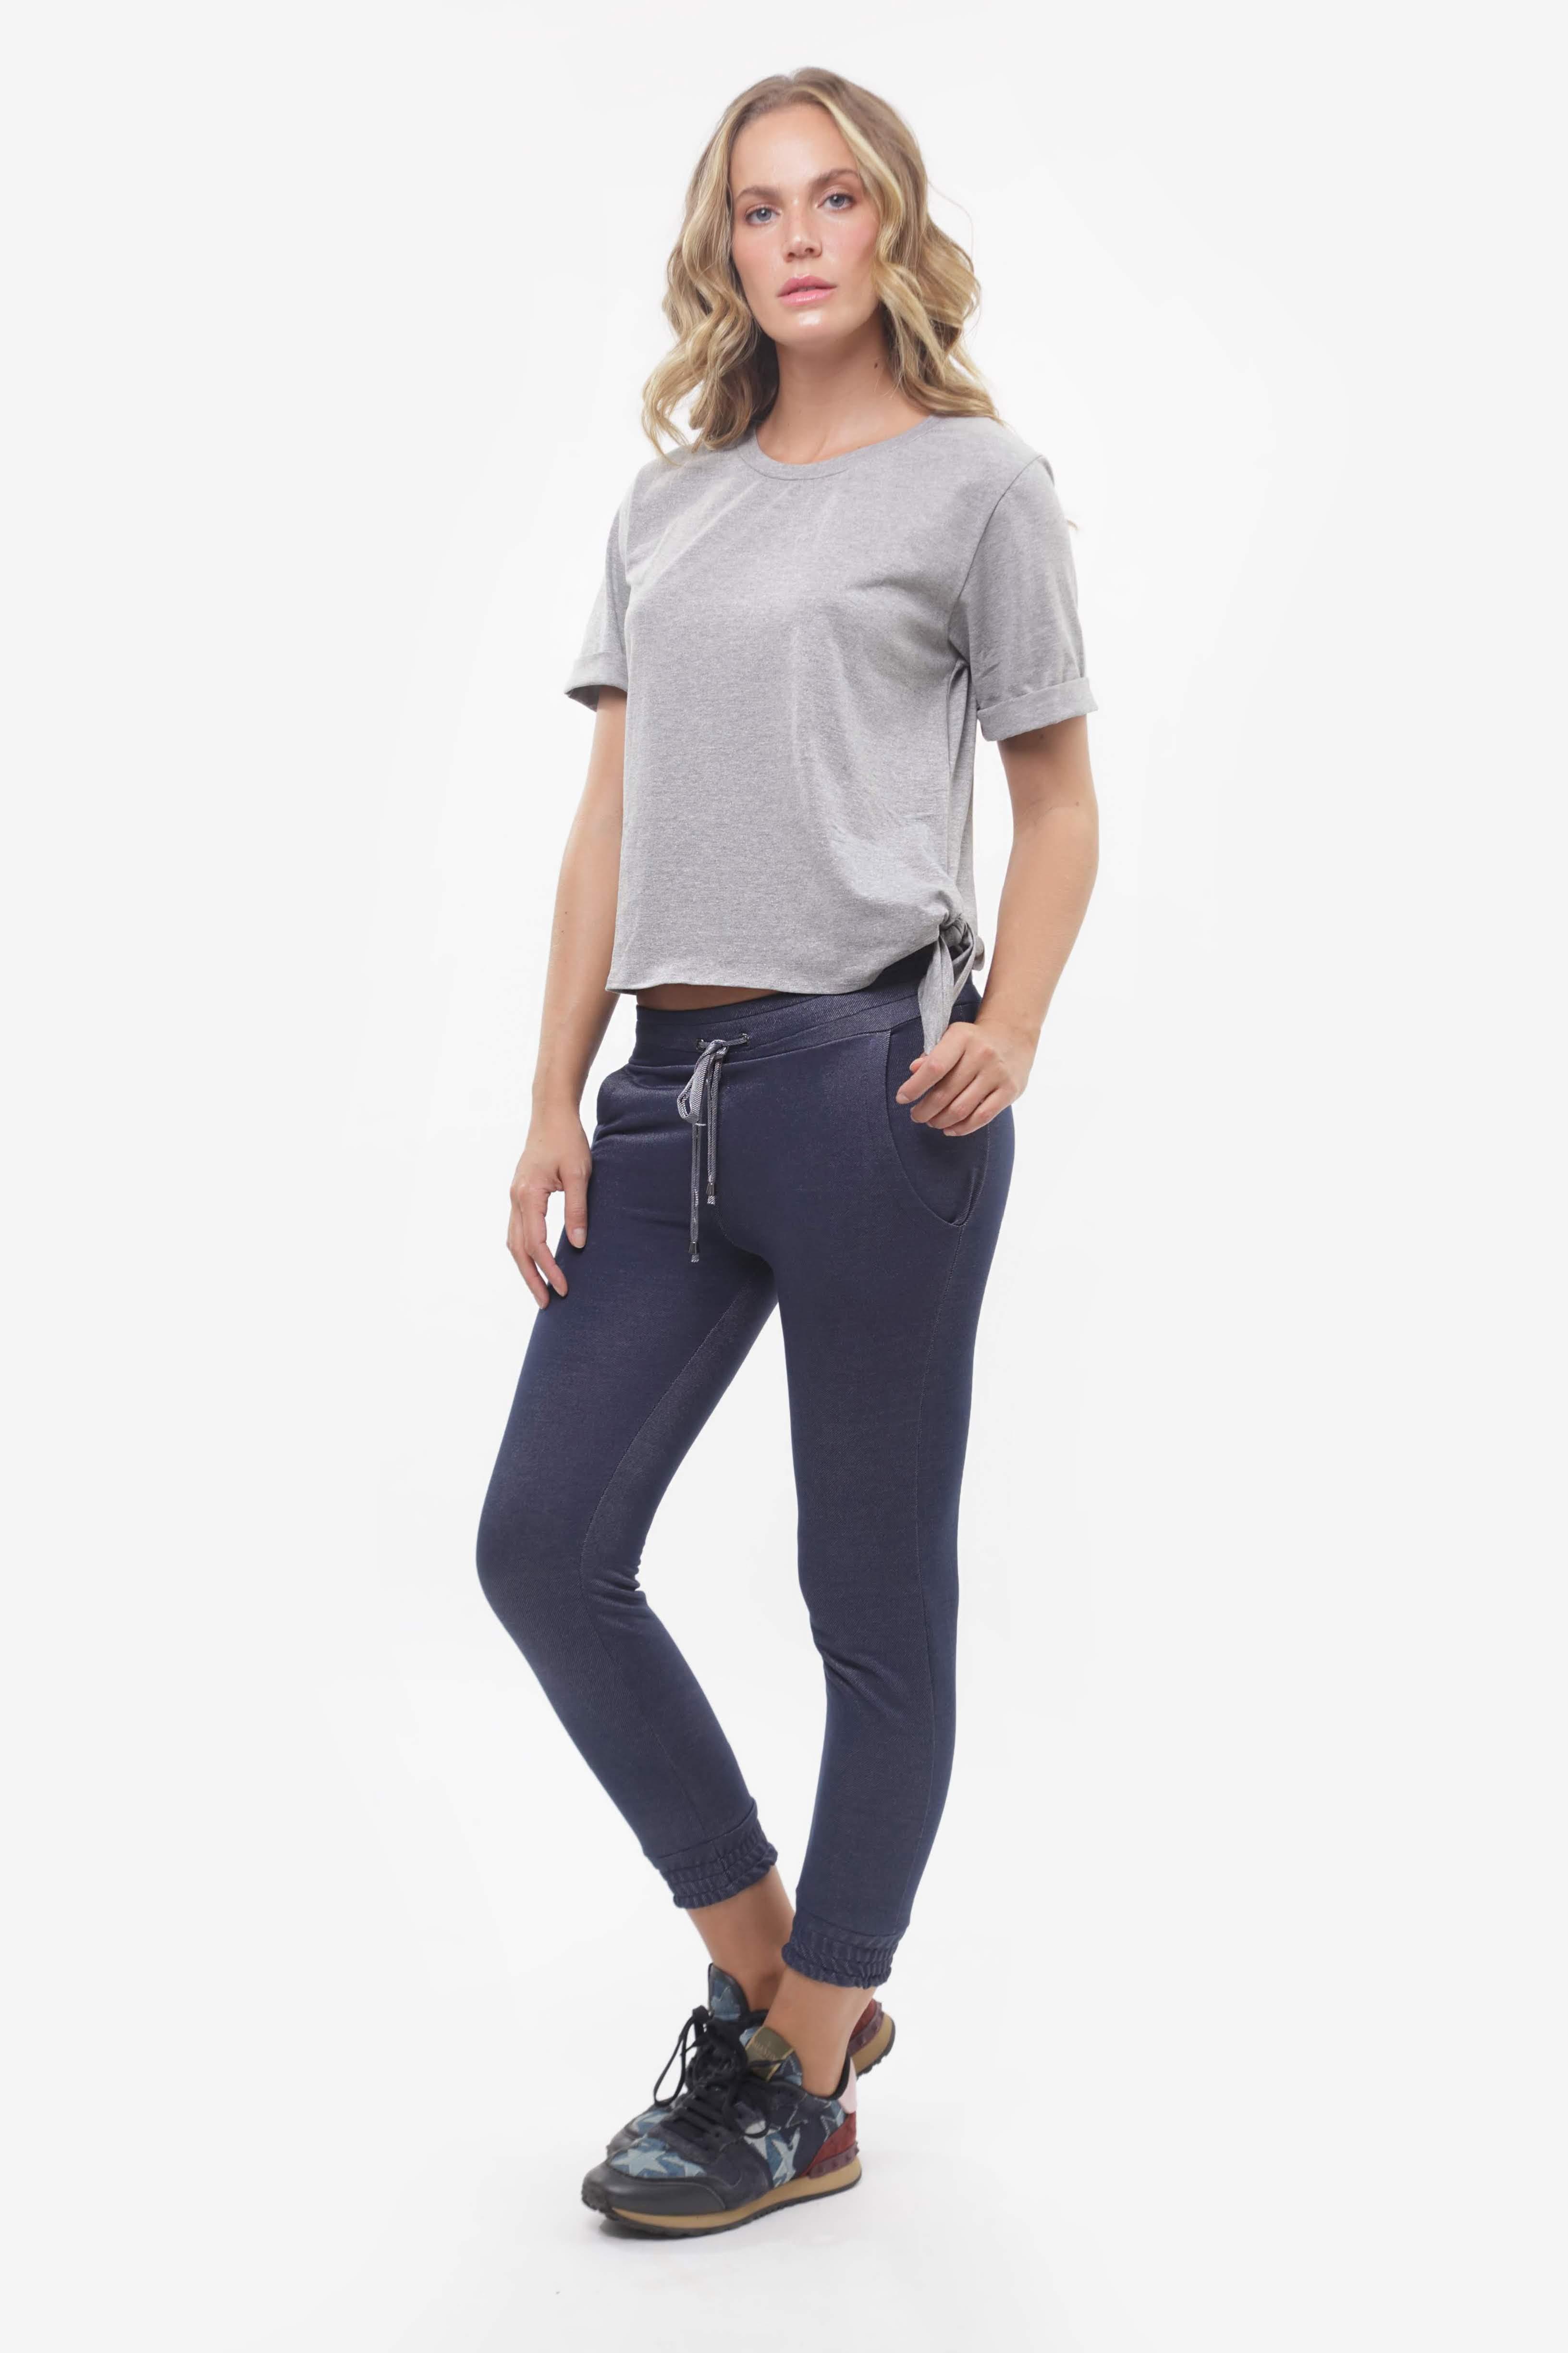 Tshirt Carneiros e Jogger Jeans